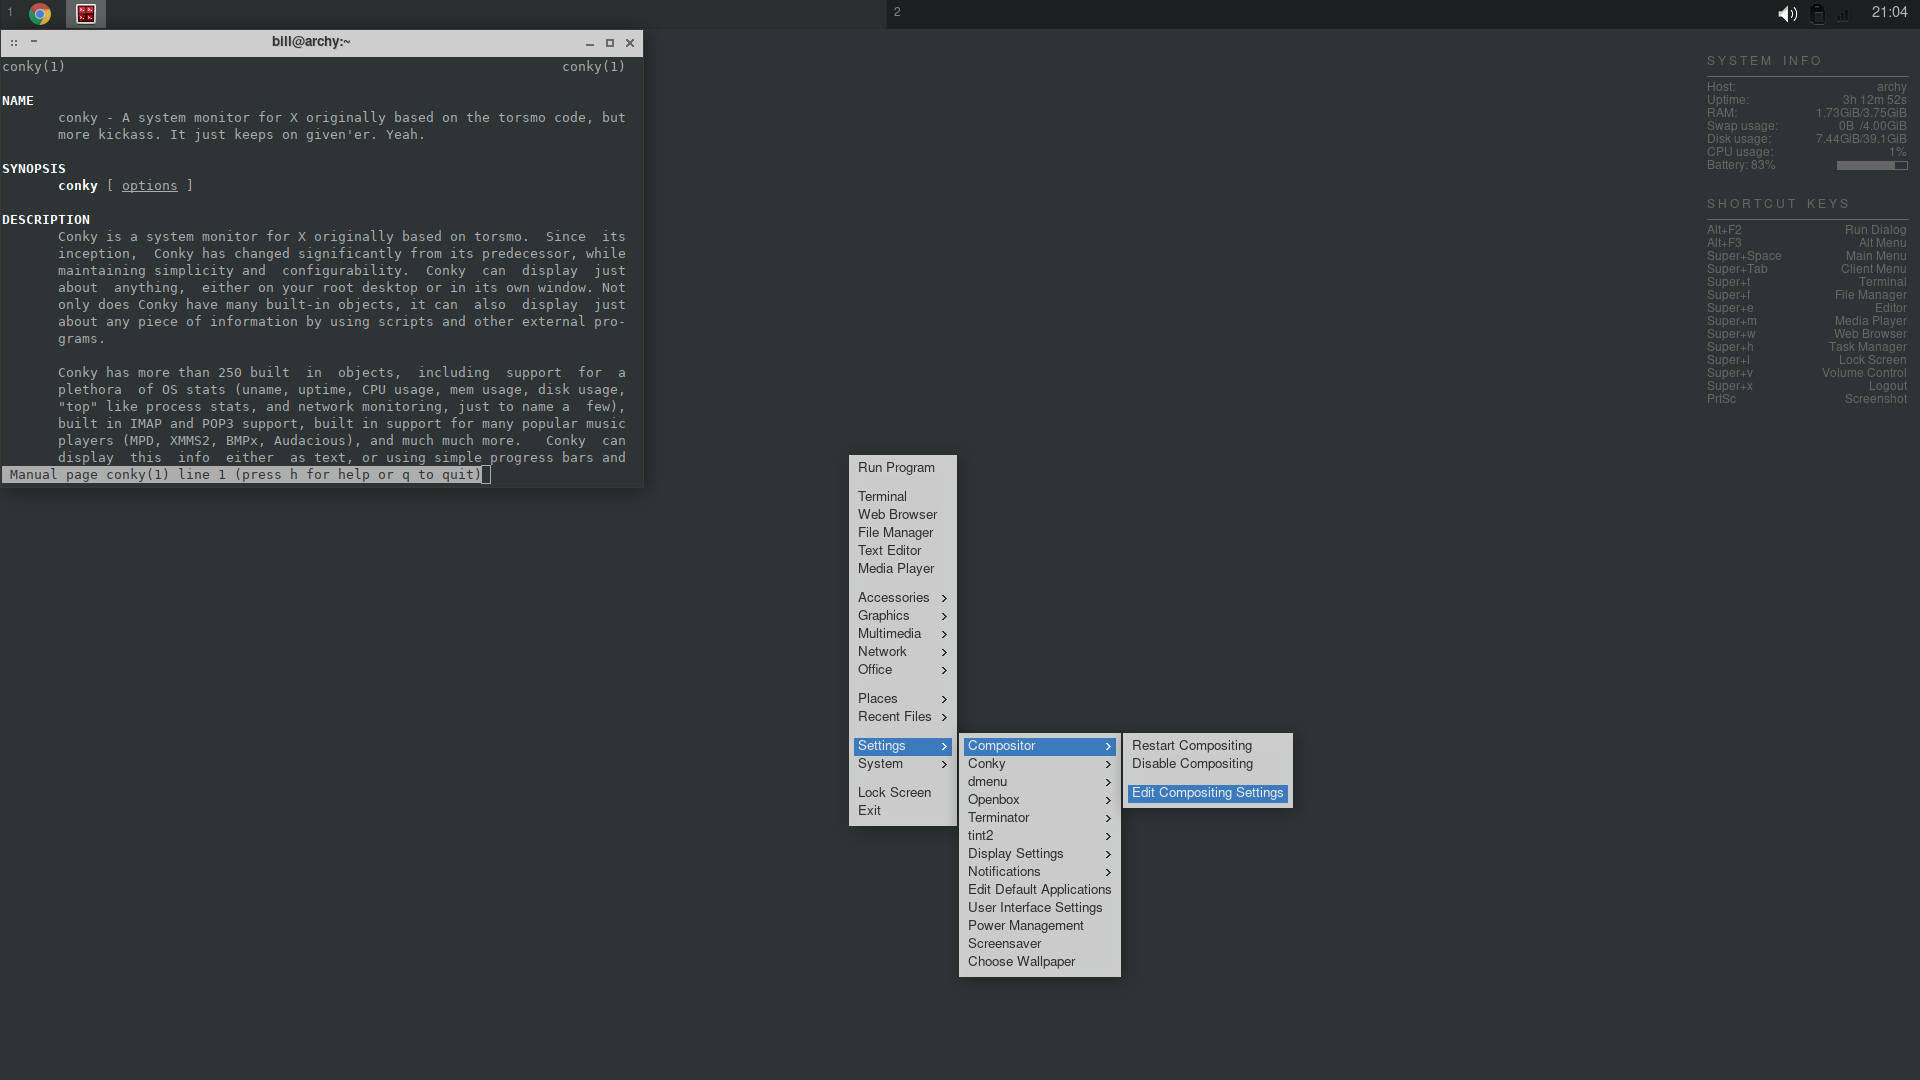 GitHub - nubilfi/archlinux-openbox: Archlinux Minimalist Edition